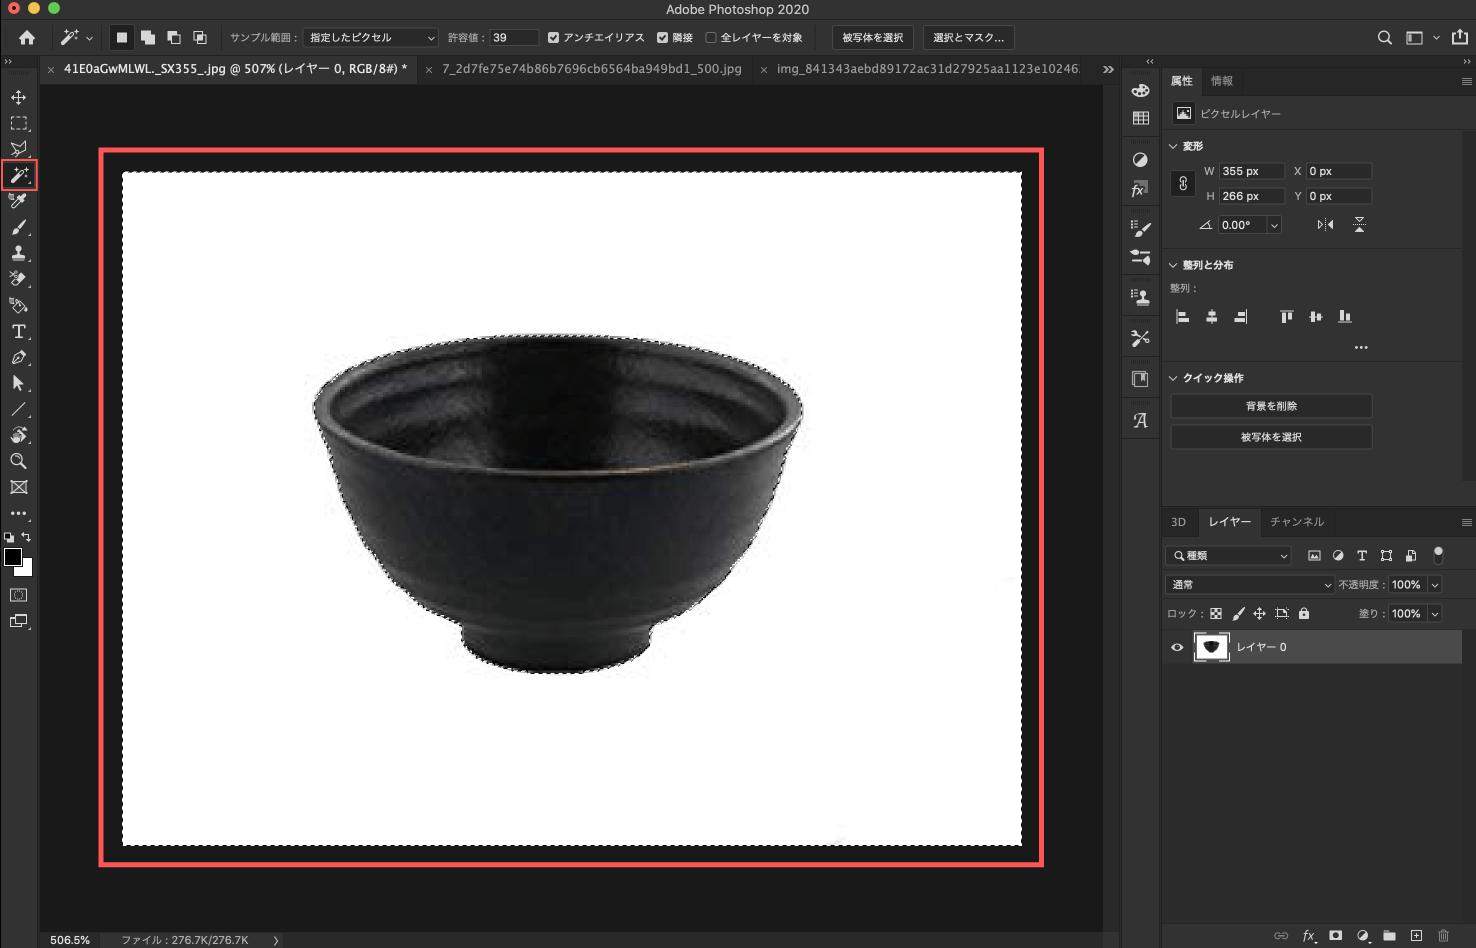 Adobe CC Photoshop フォトショップ 切り抜き 髪の毛 簡単 切り抜き 素材 読み込み 自動選択ツール